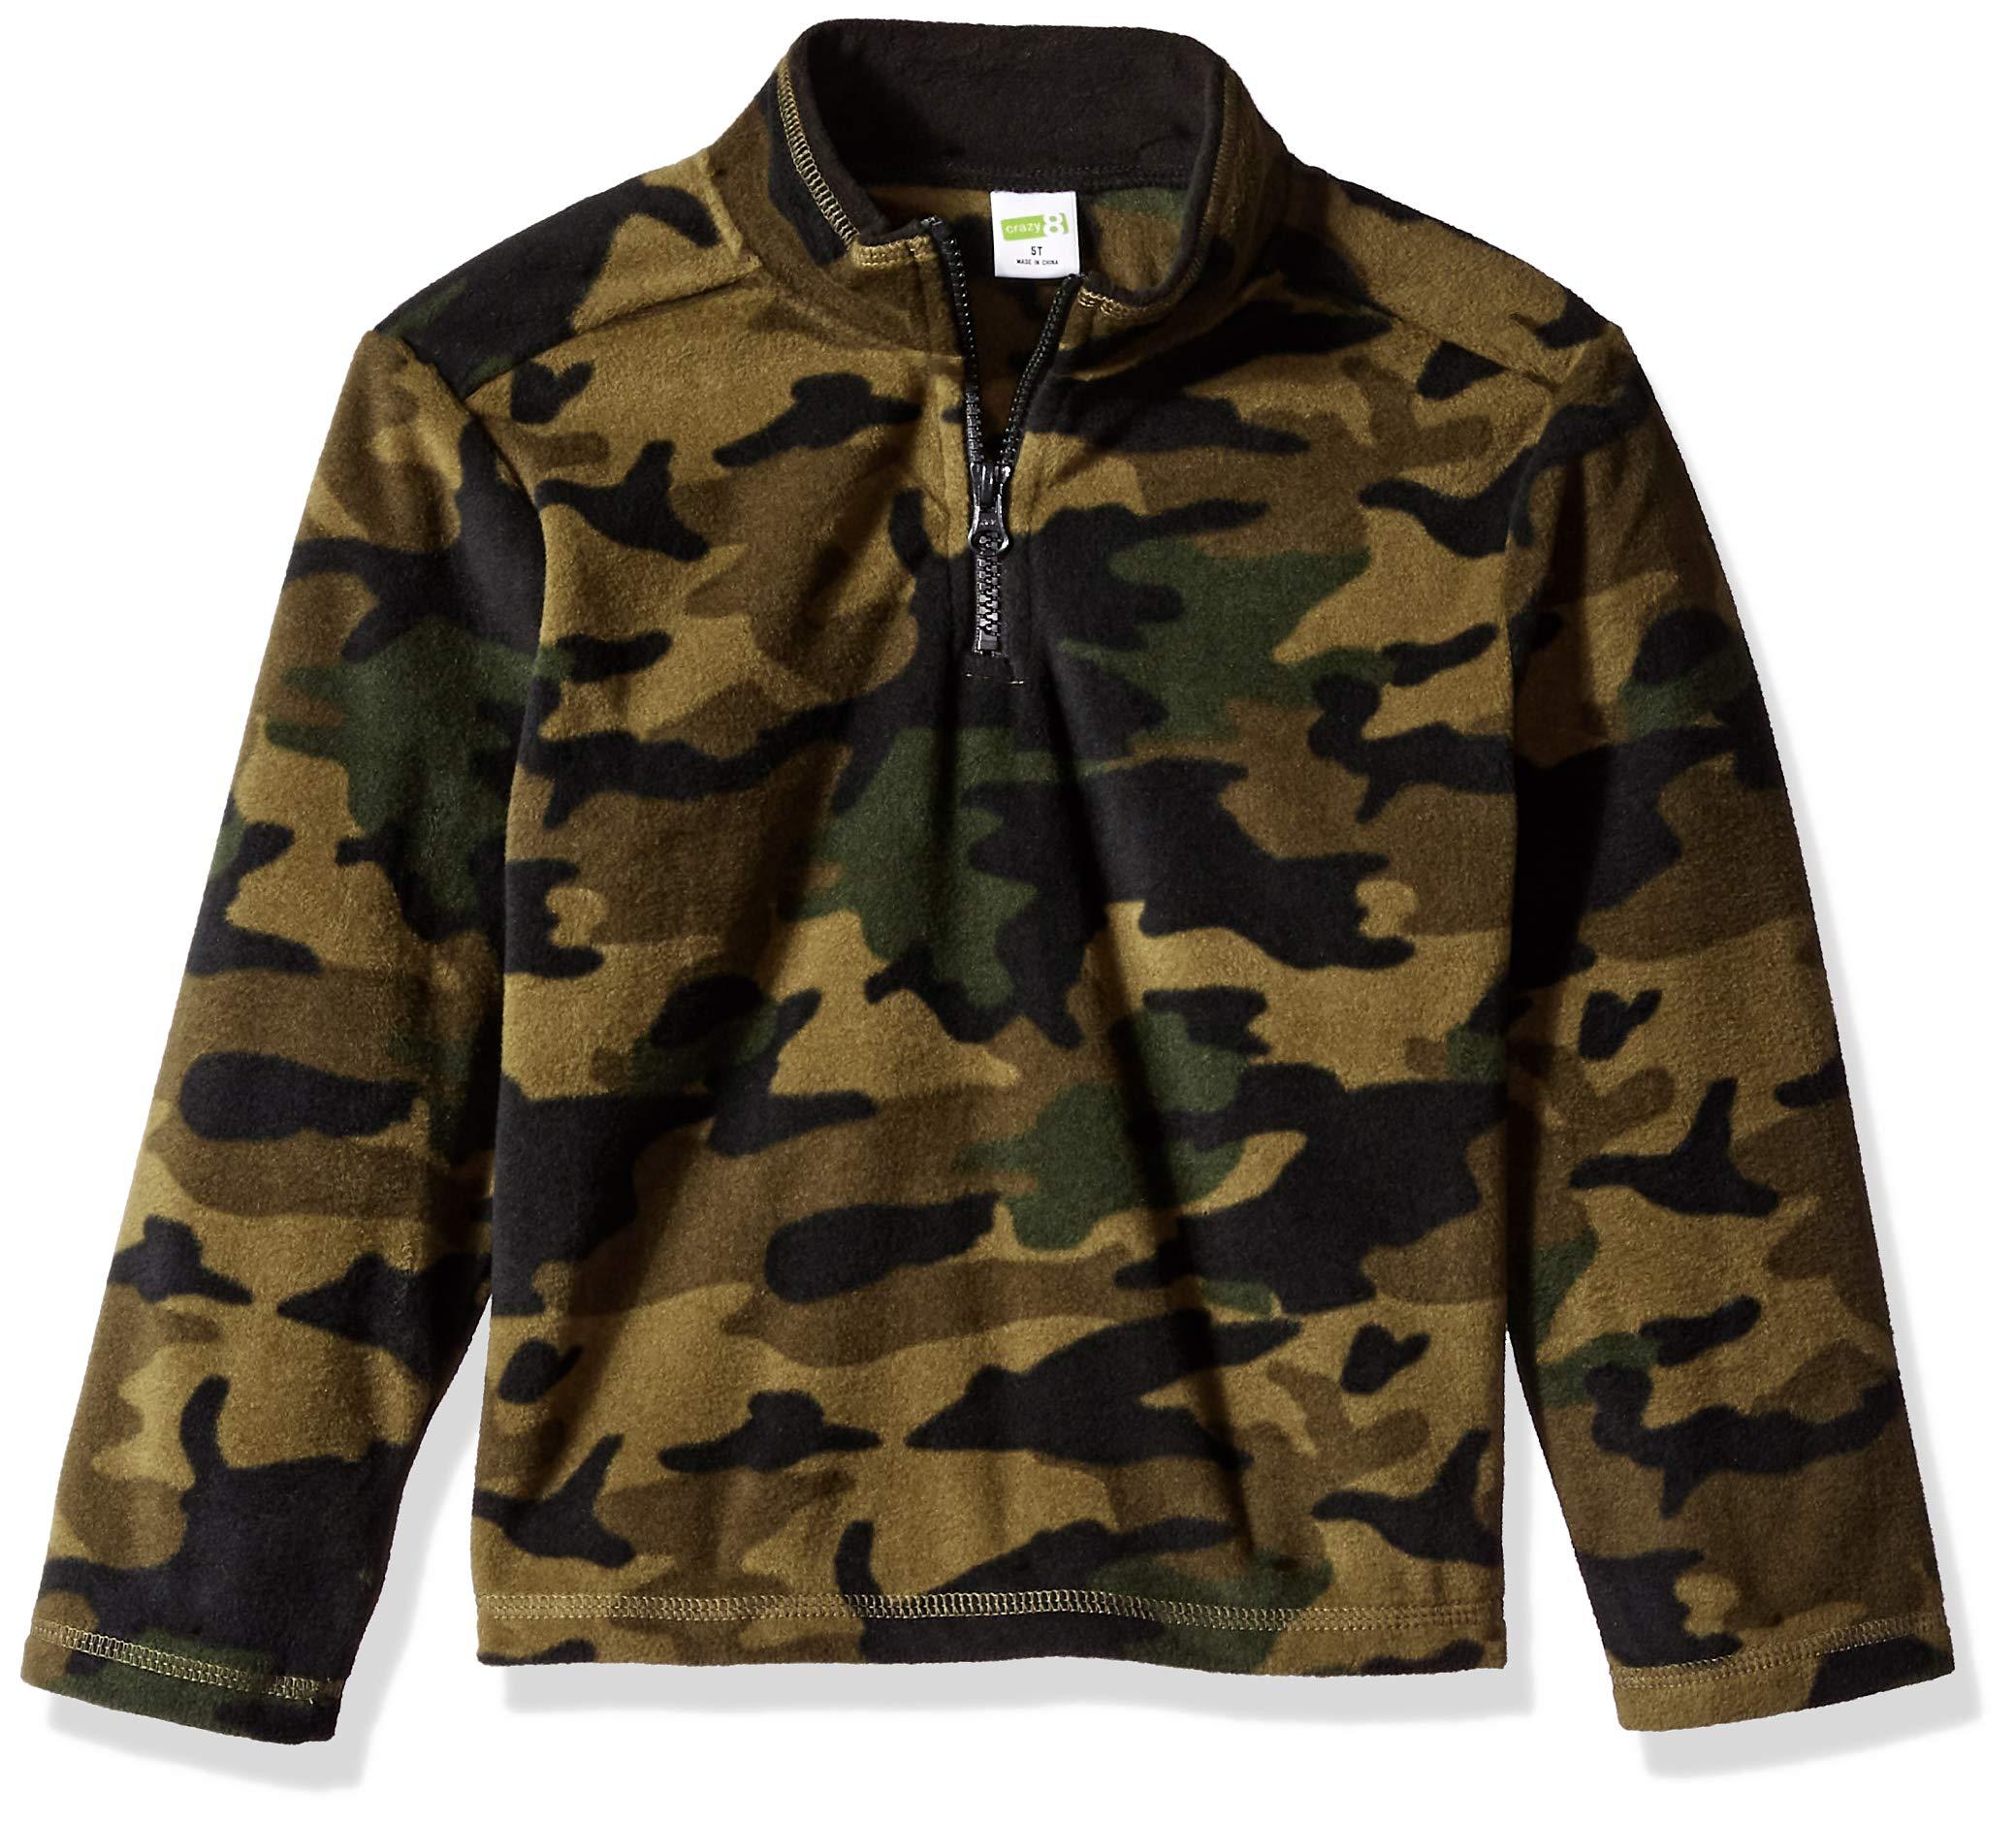 Crazy 8 Boys' Big Half Zip Pullover Sweater, Four Leaf Clover, 5T